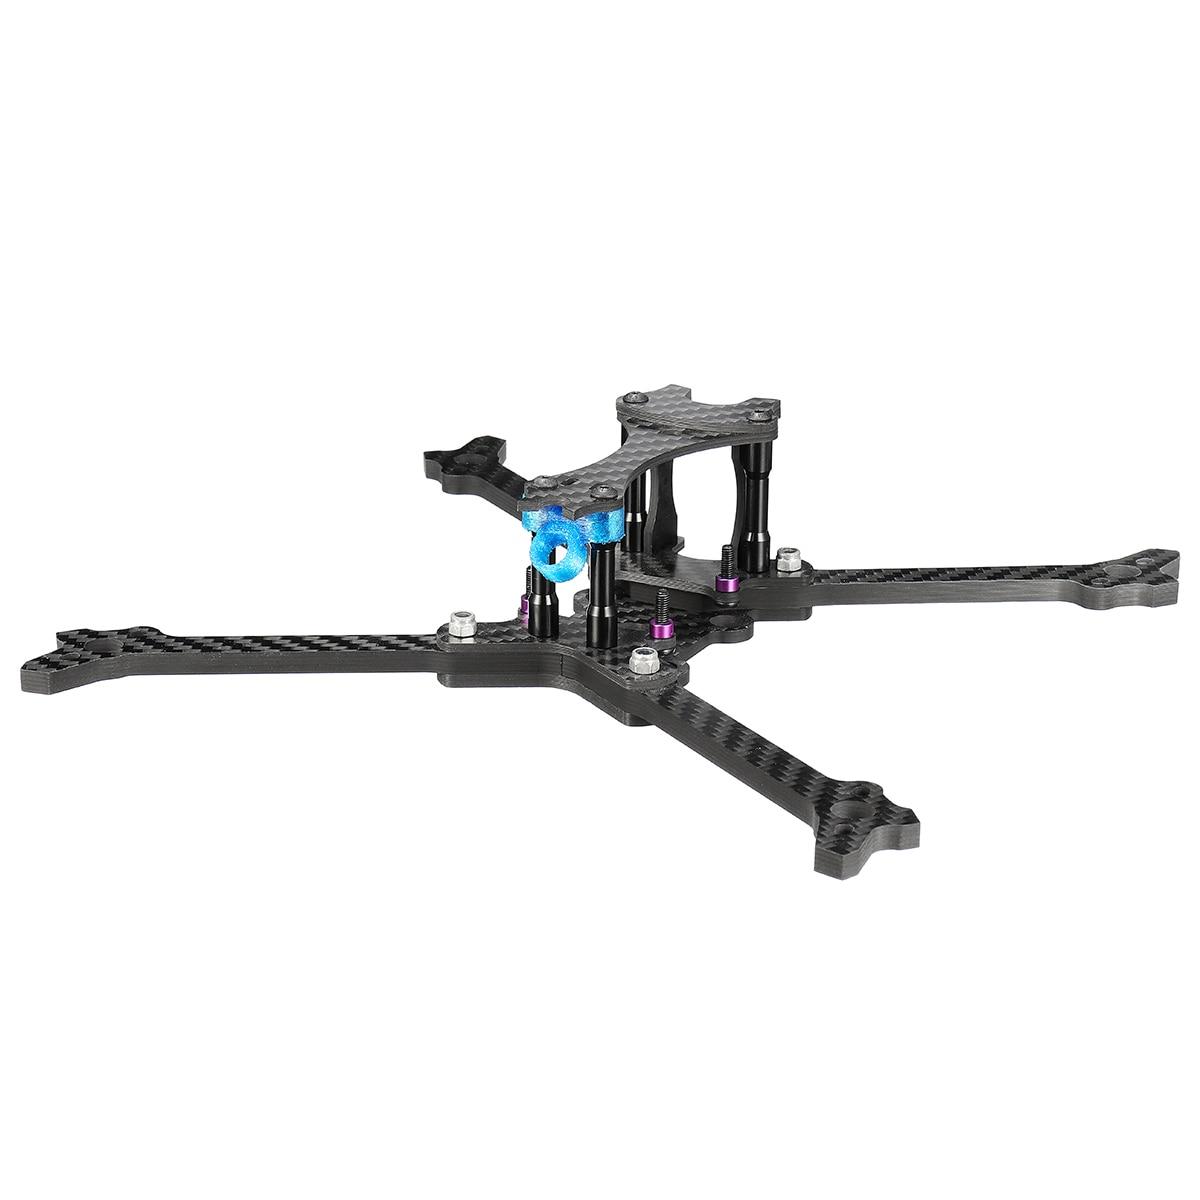 Aliexpress Buy Uruav Nex220 220mm 5 Inch Frame Kit